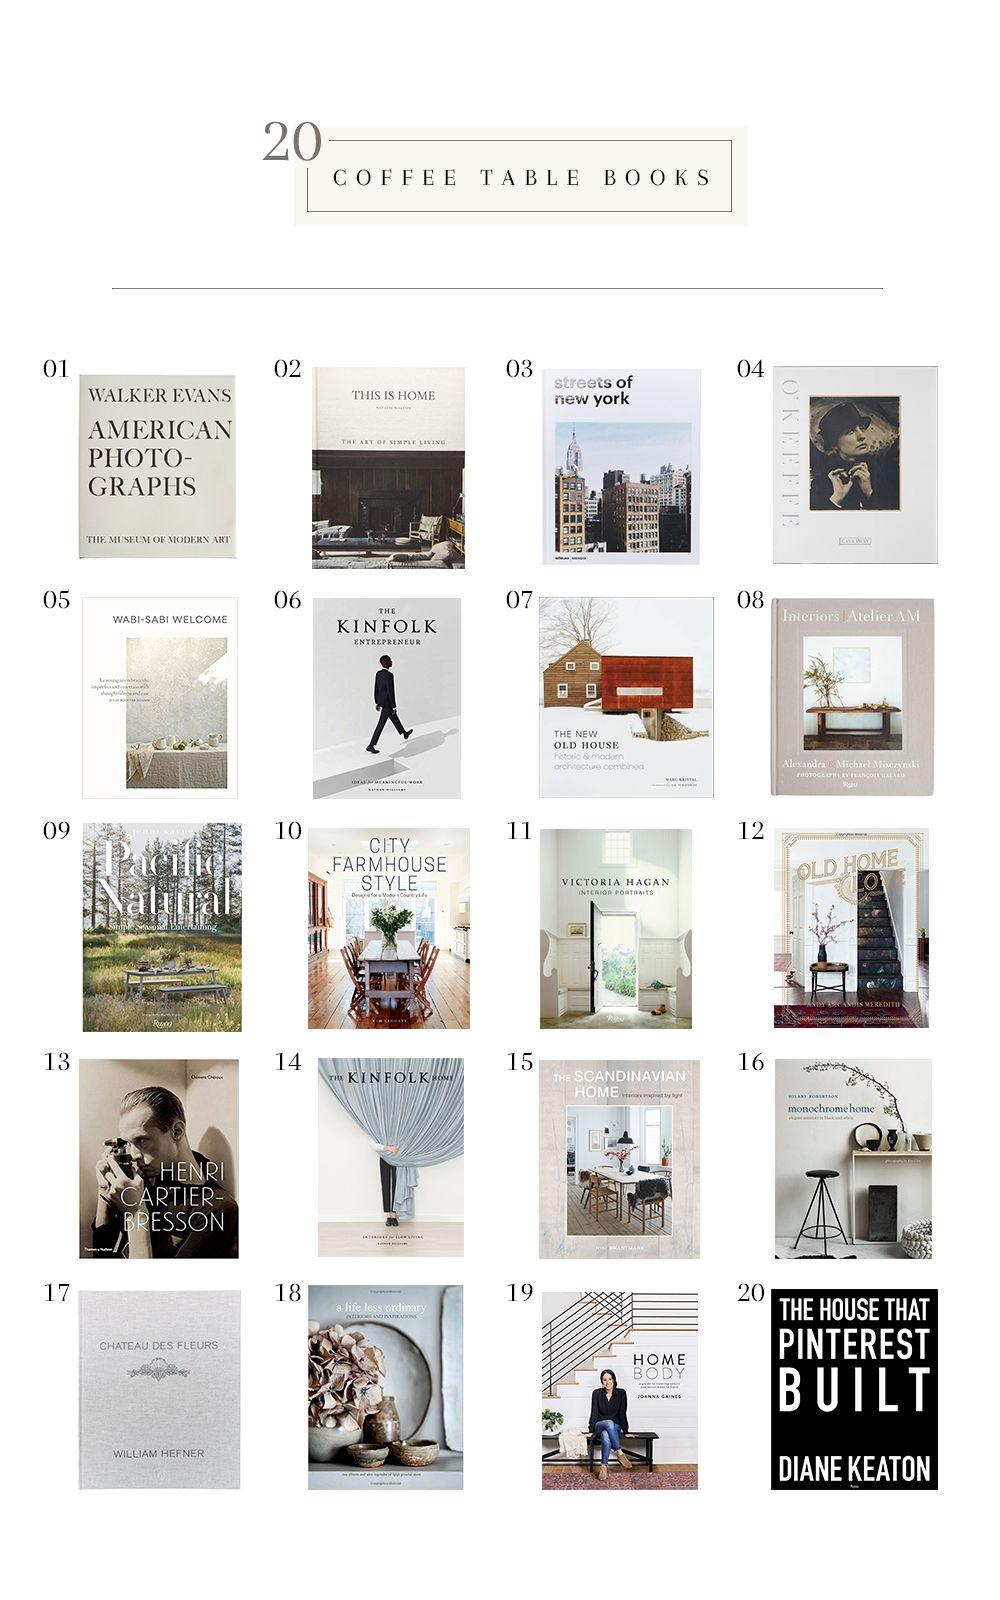 20 Favorite Coffee Table Books Coffee Table Books Decor Coffee Table Books Best Coffee Table Books [ 1600 x 1000 Pixel ]